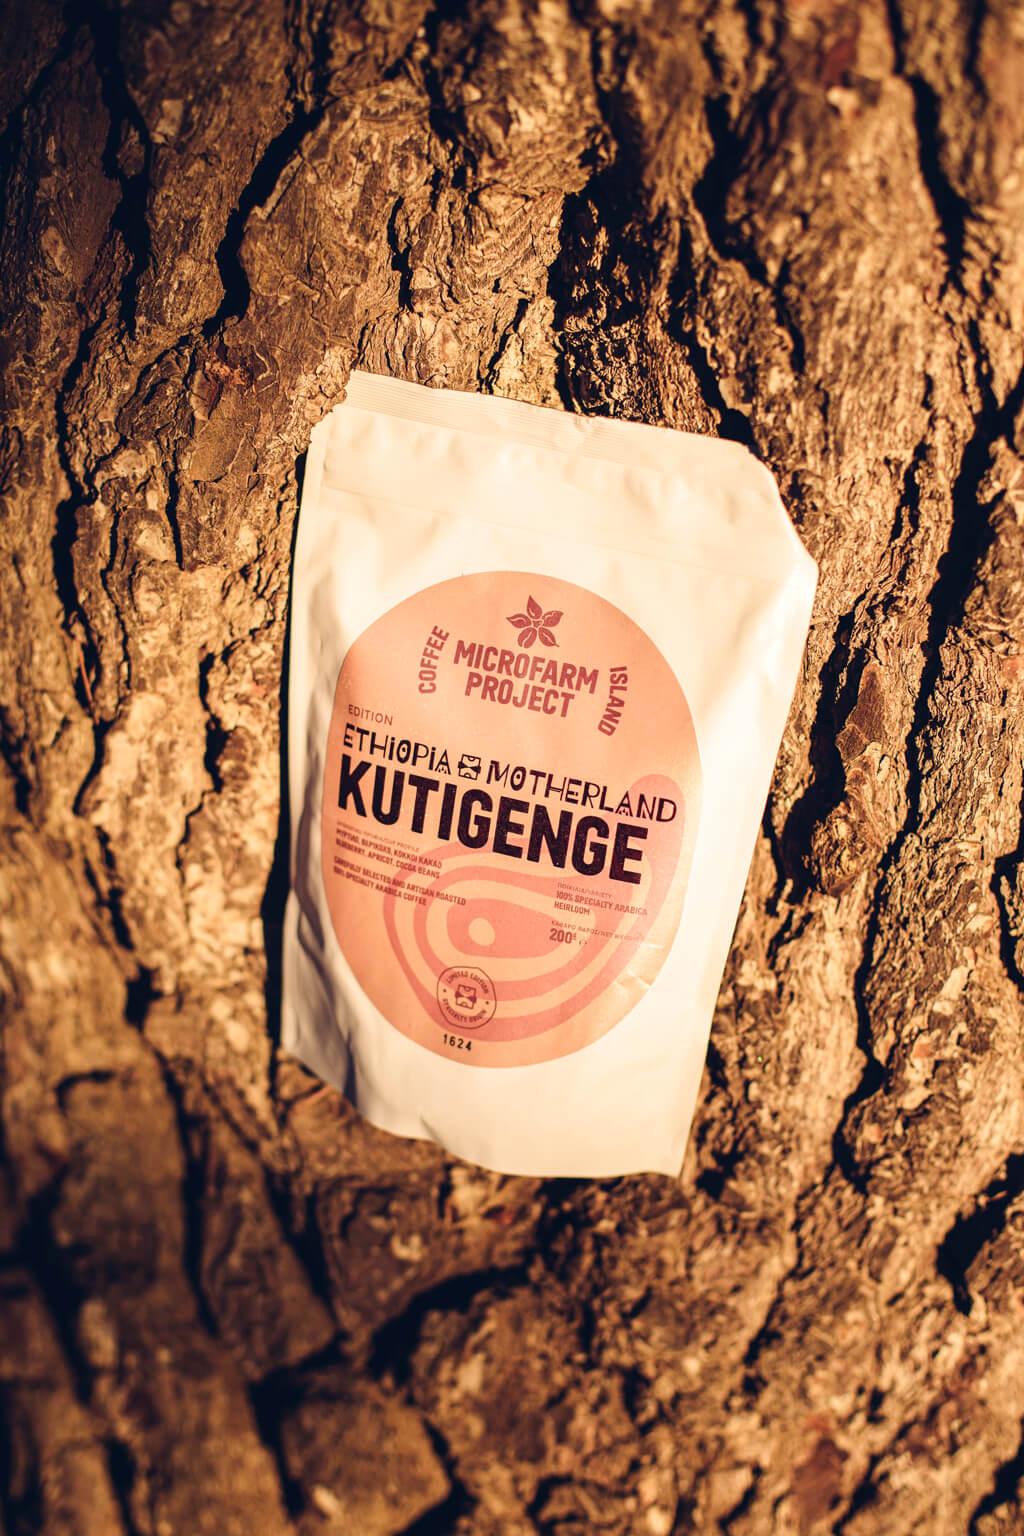 Coffee Island's Ethiopia Kutigenge.